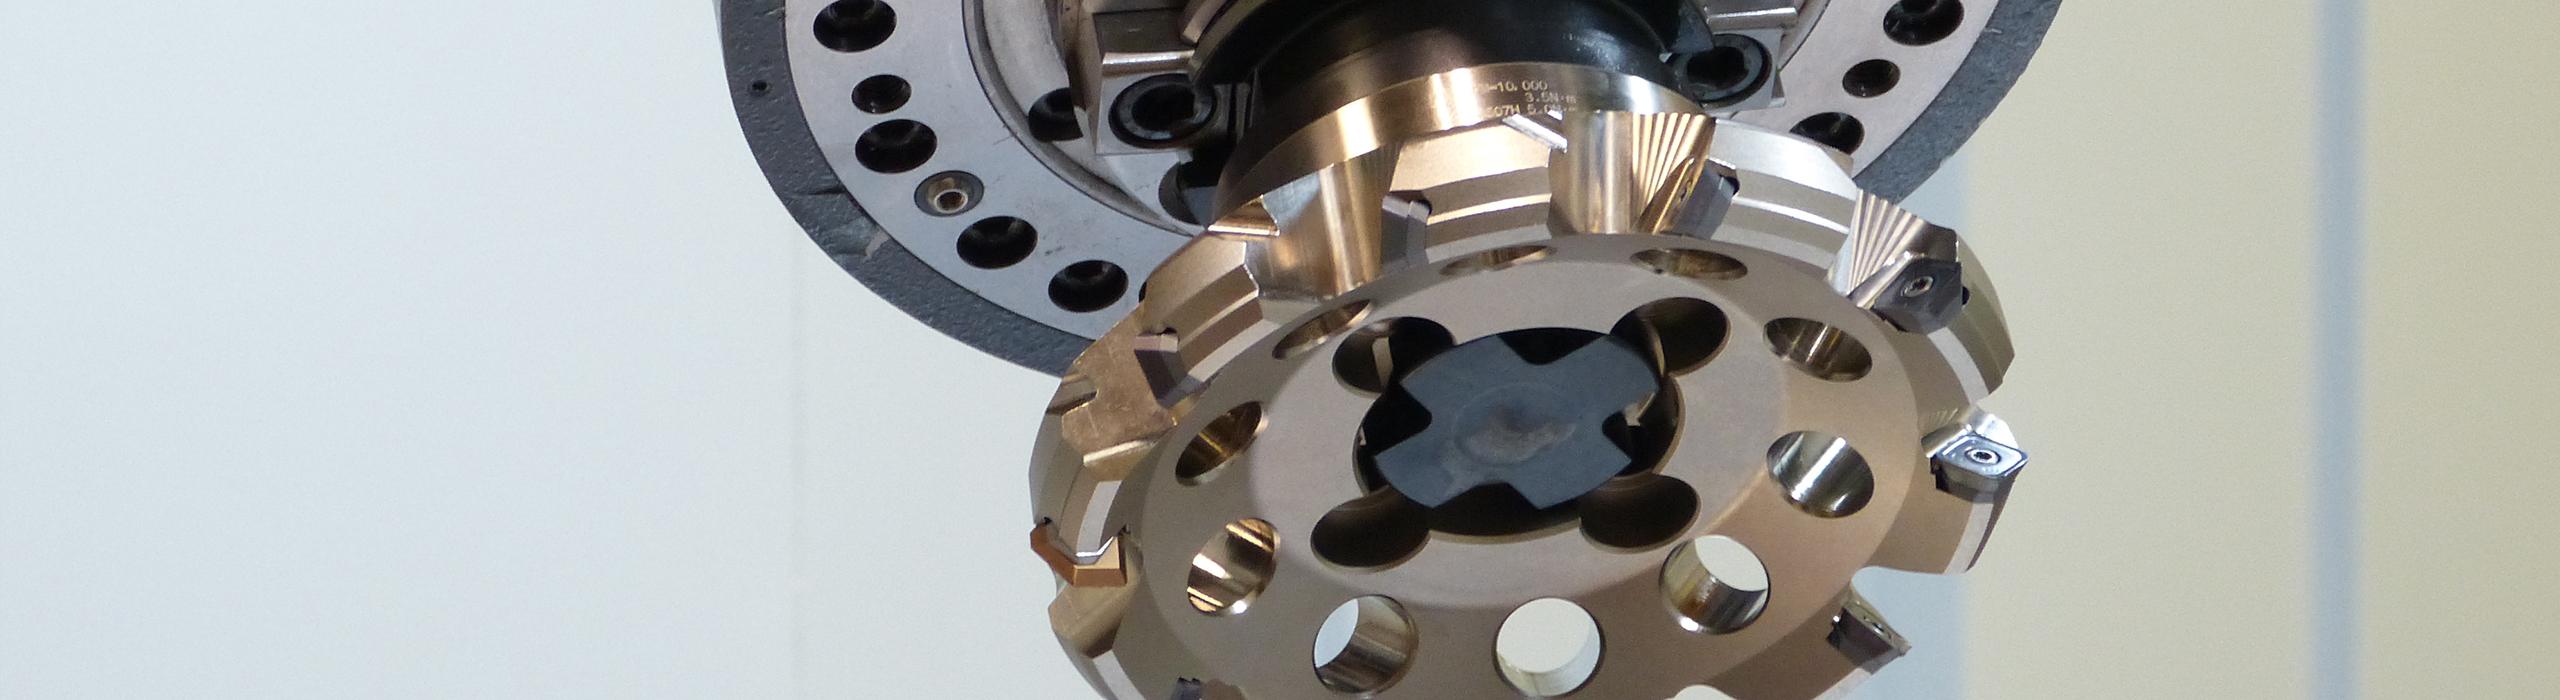 RSB-Stahl-cnc-header2